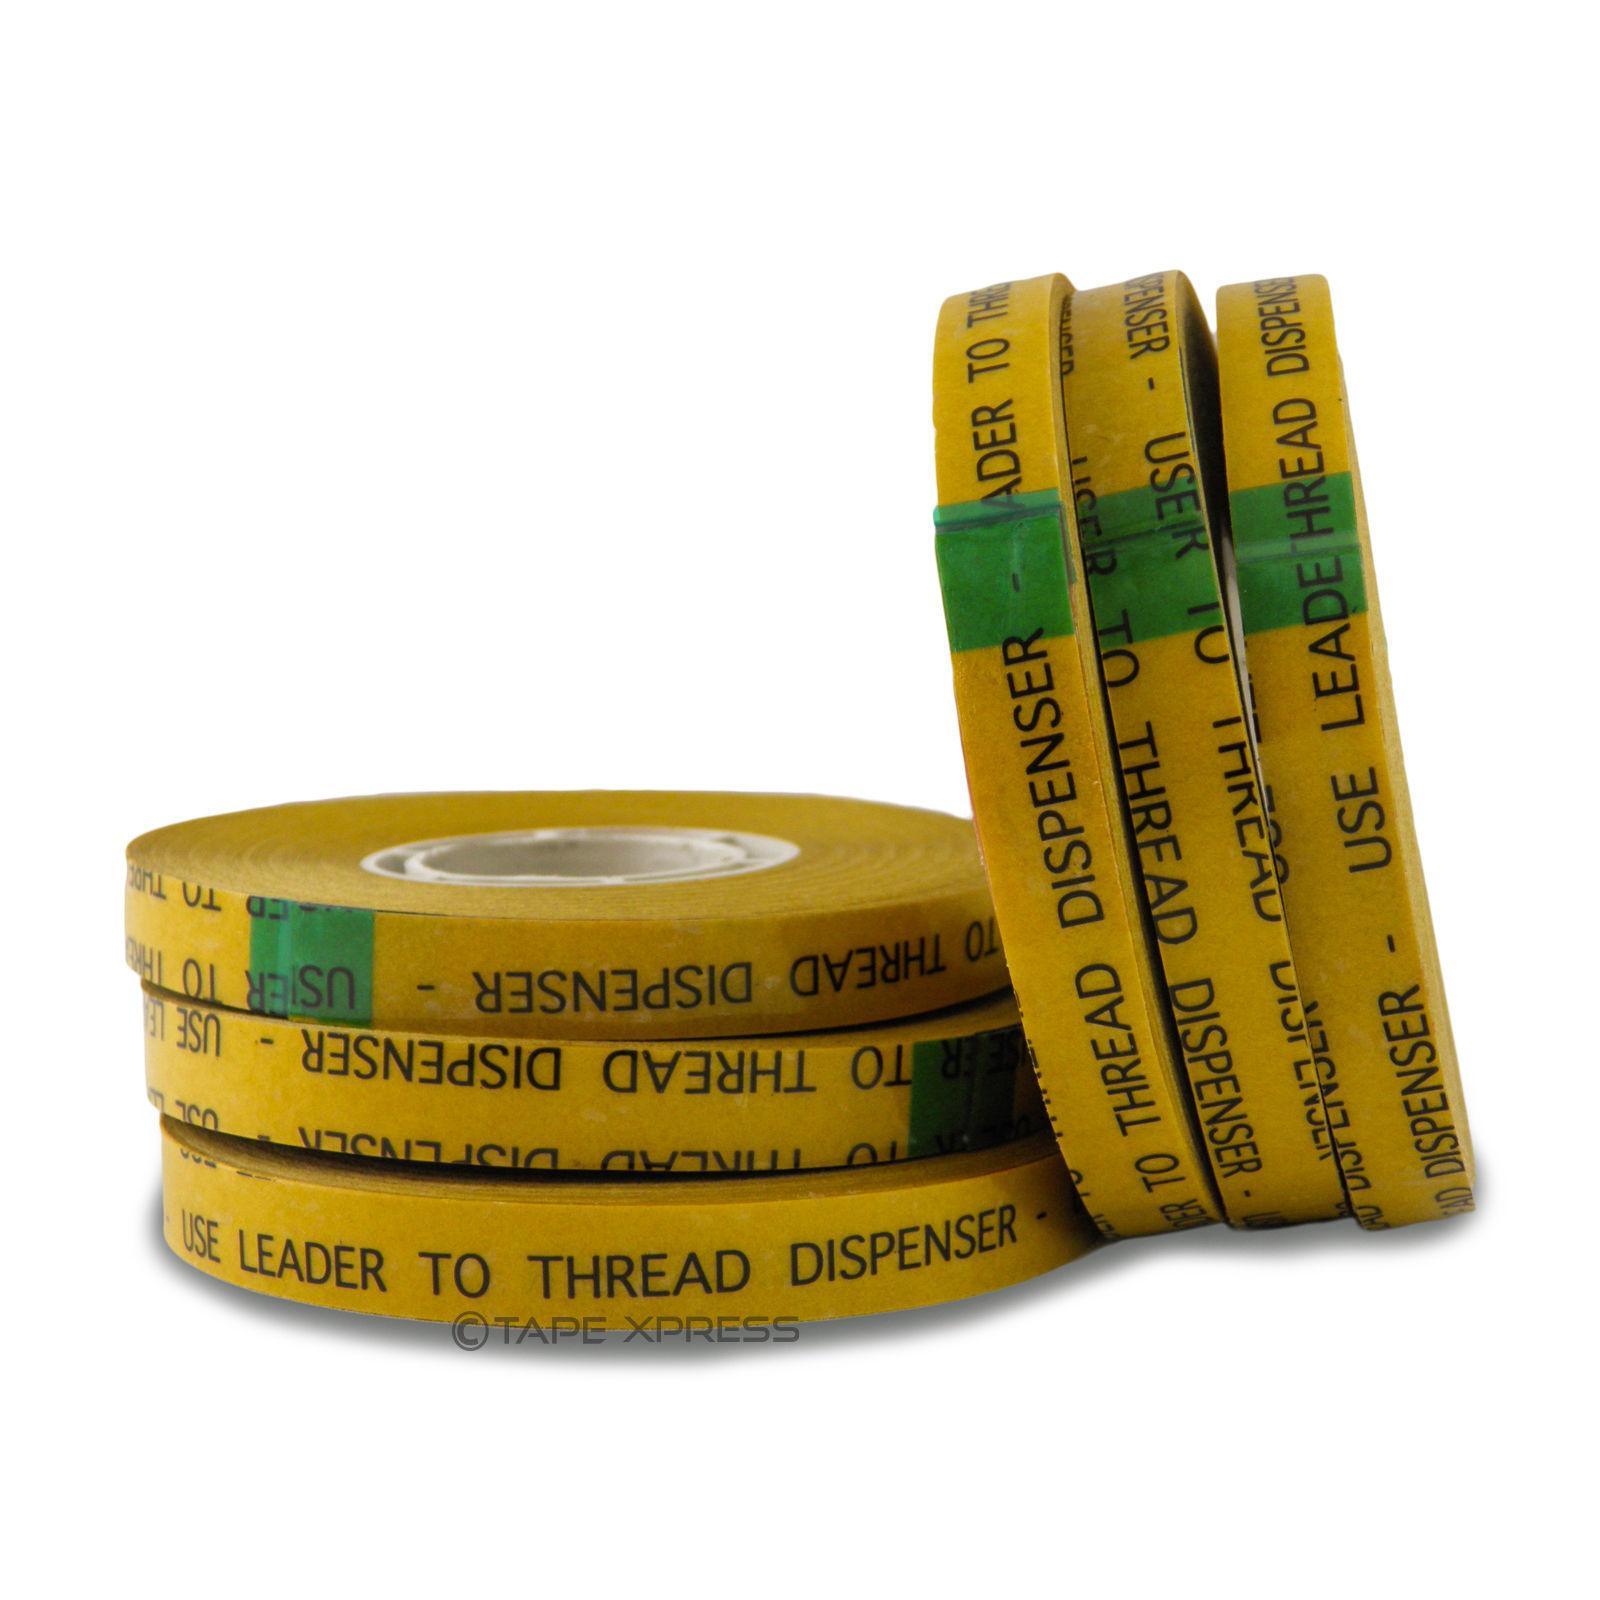 "6 rolls 3/8"" ATG Adhesive Transfer Tape (Fits 3M Gun) Photo Crafts Scrapbooking"